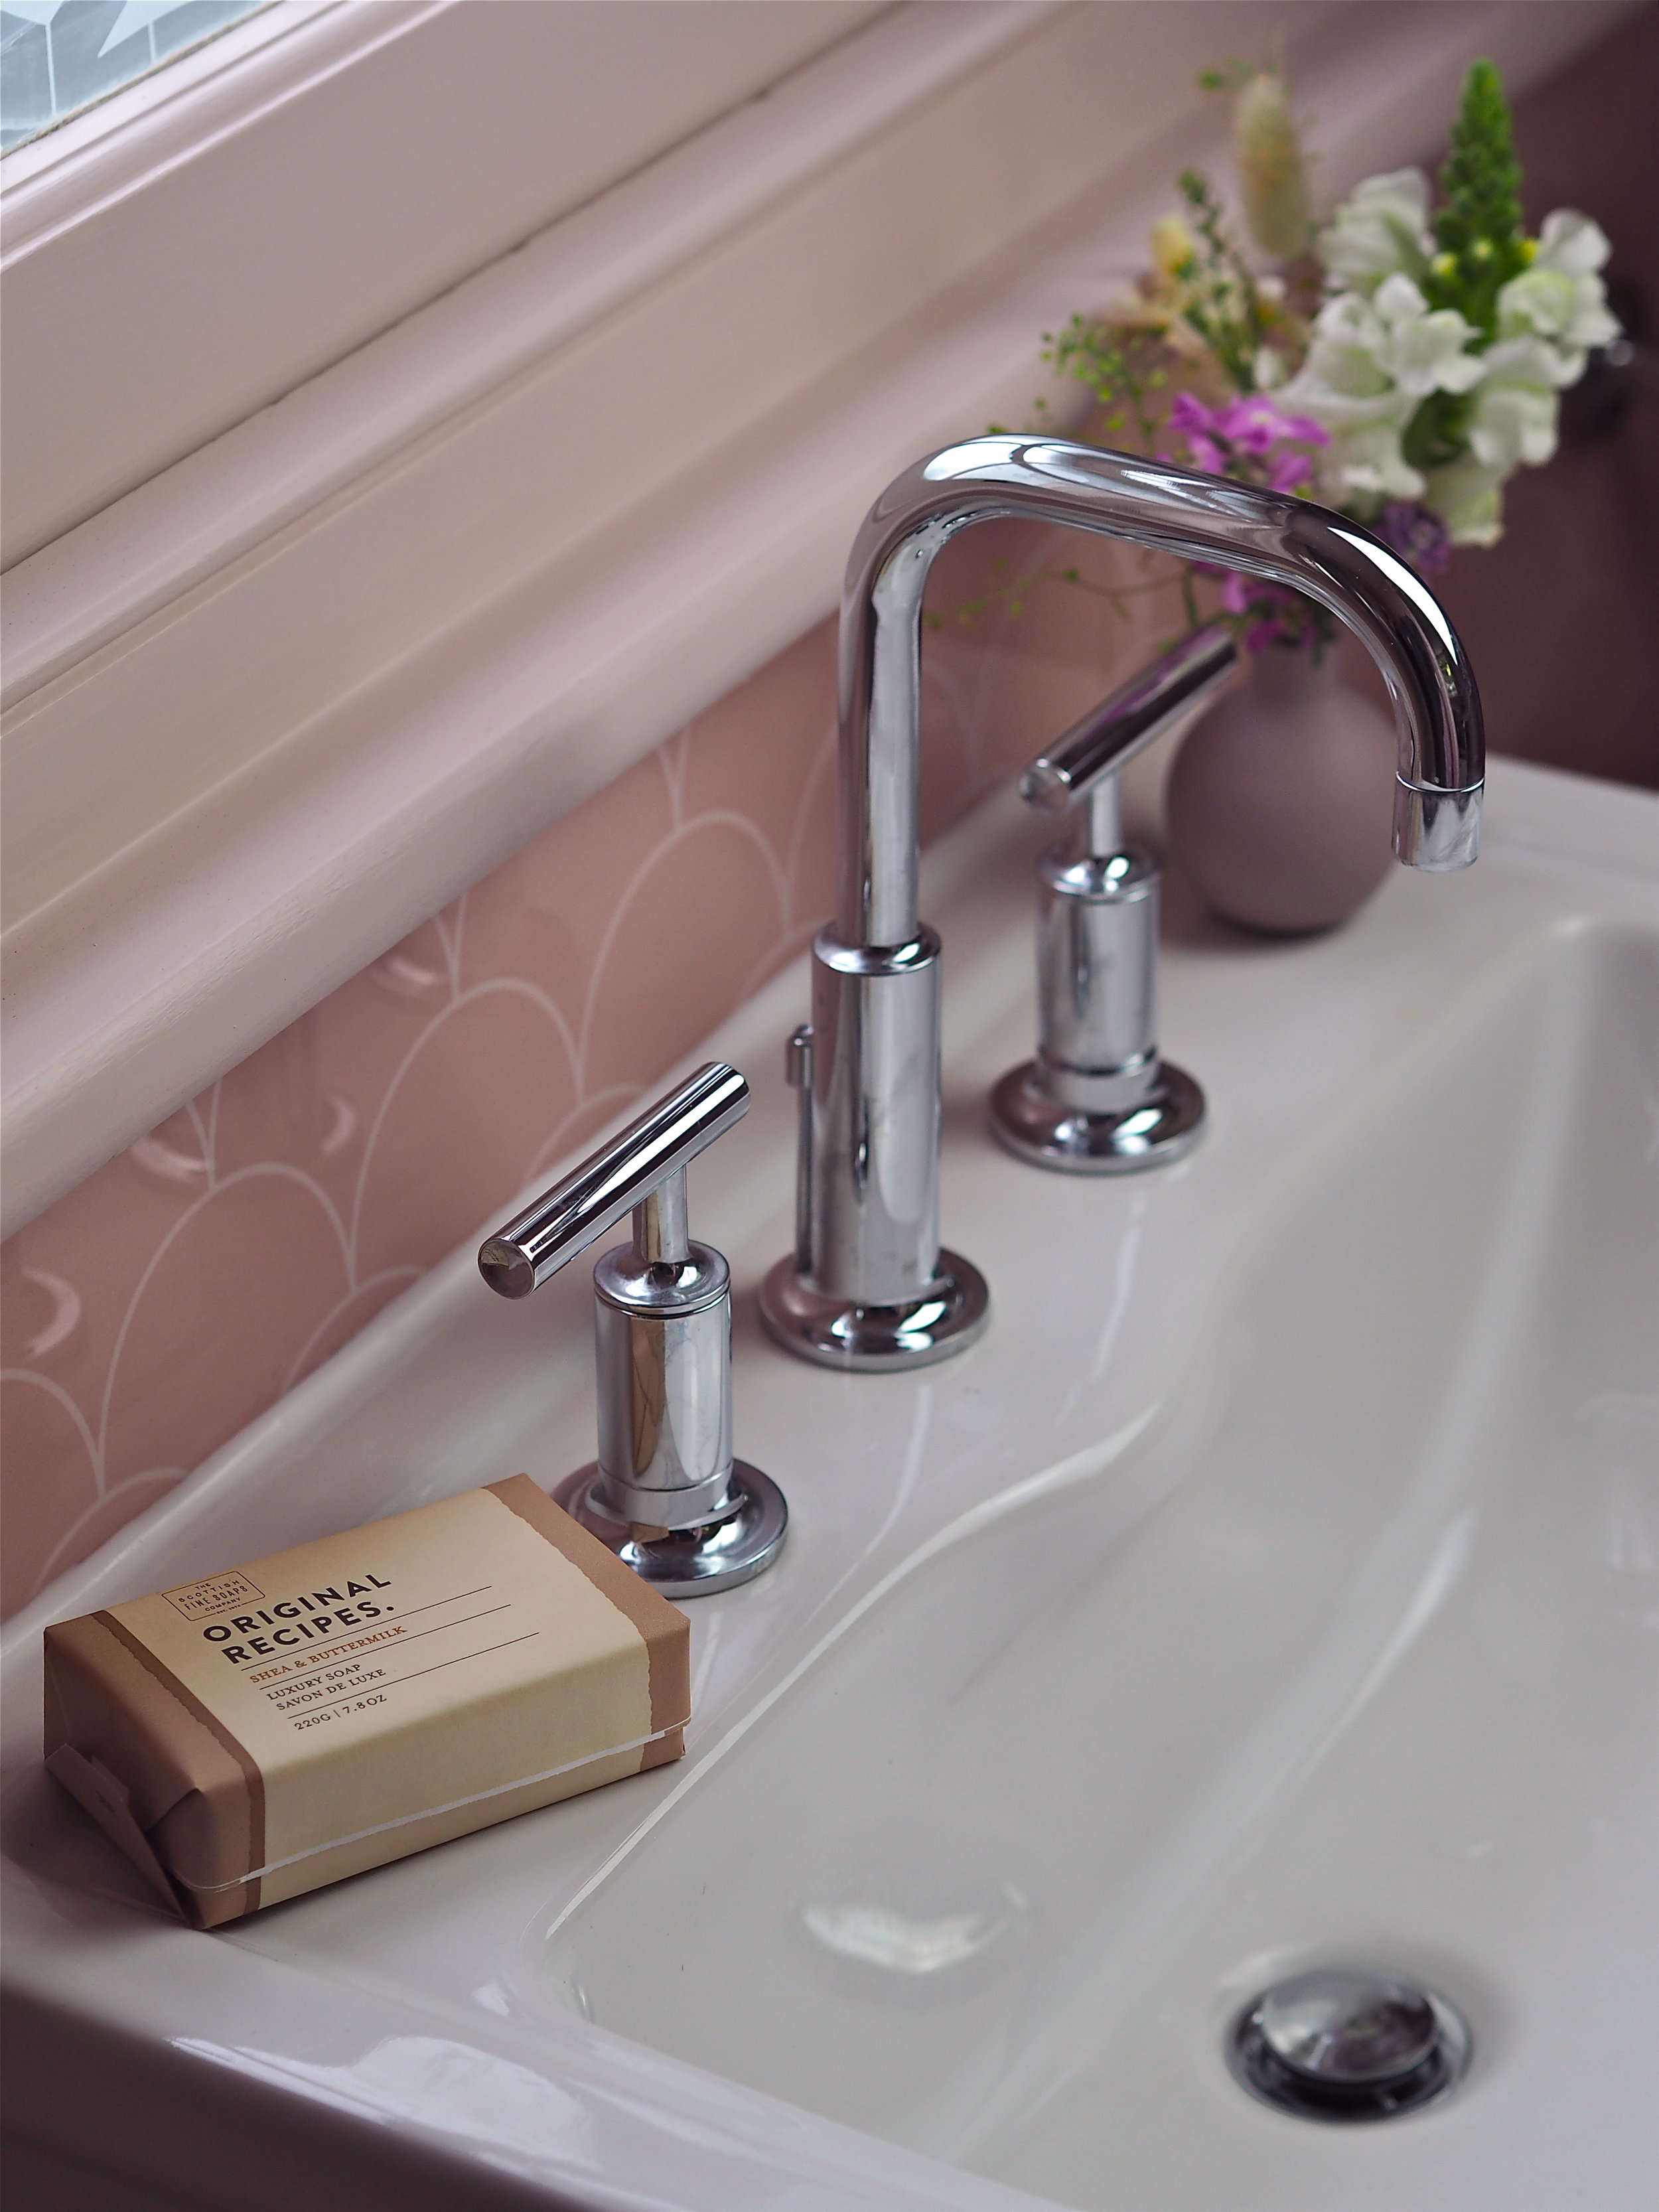 kohler purist taps in bathroom on basin